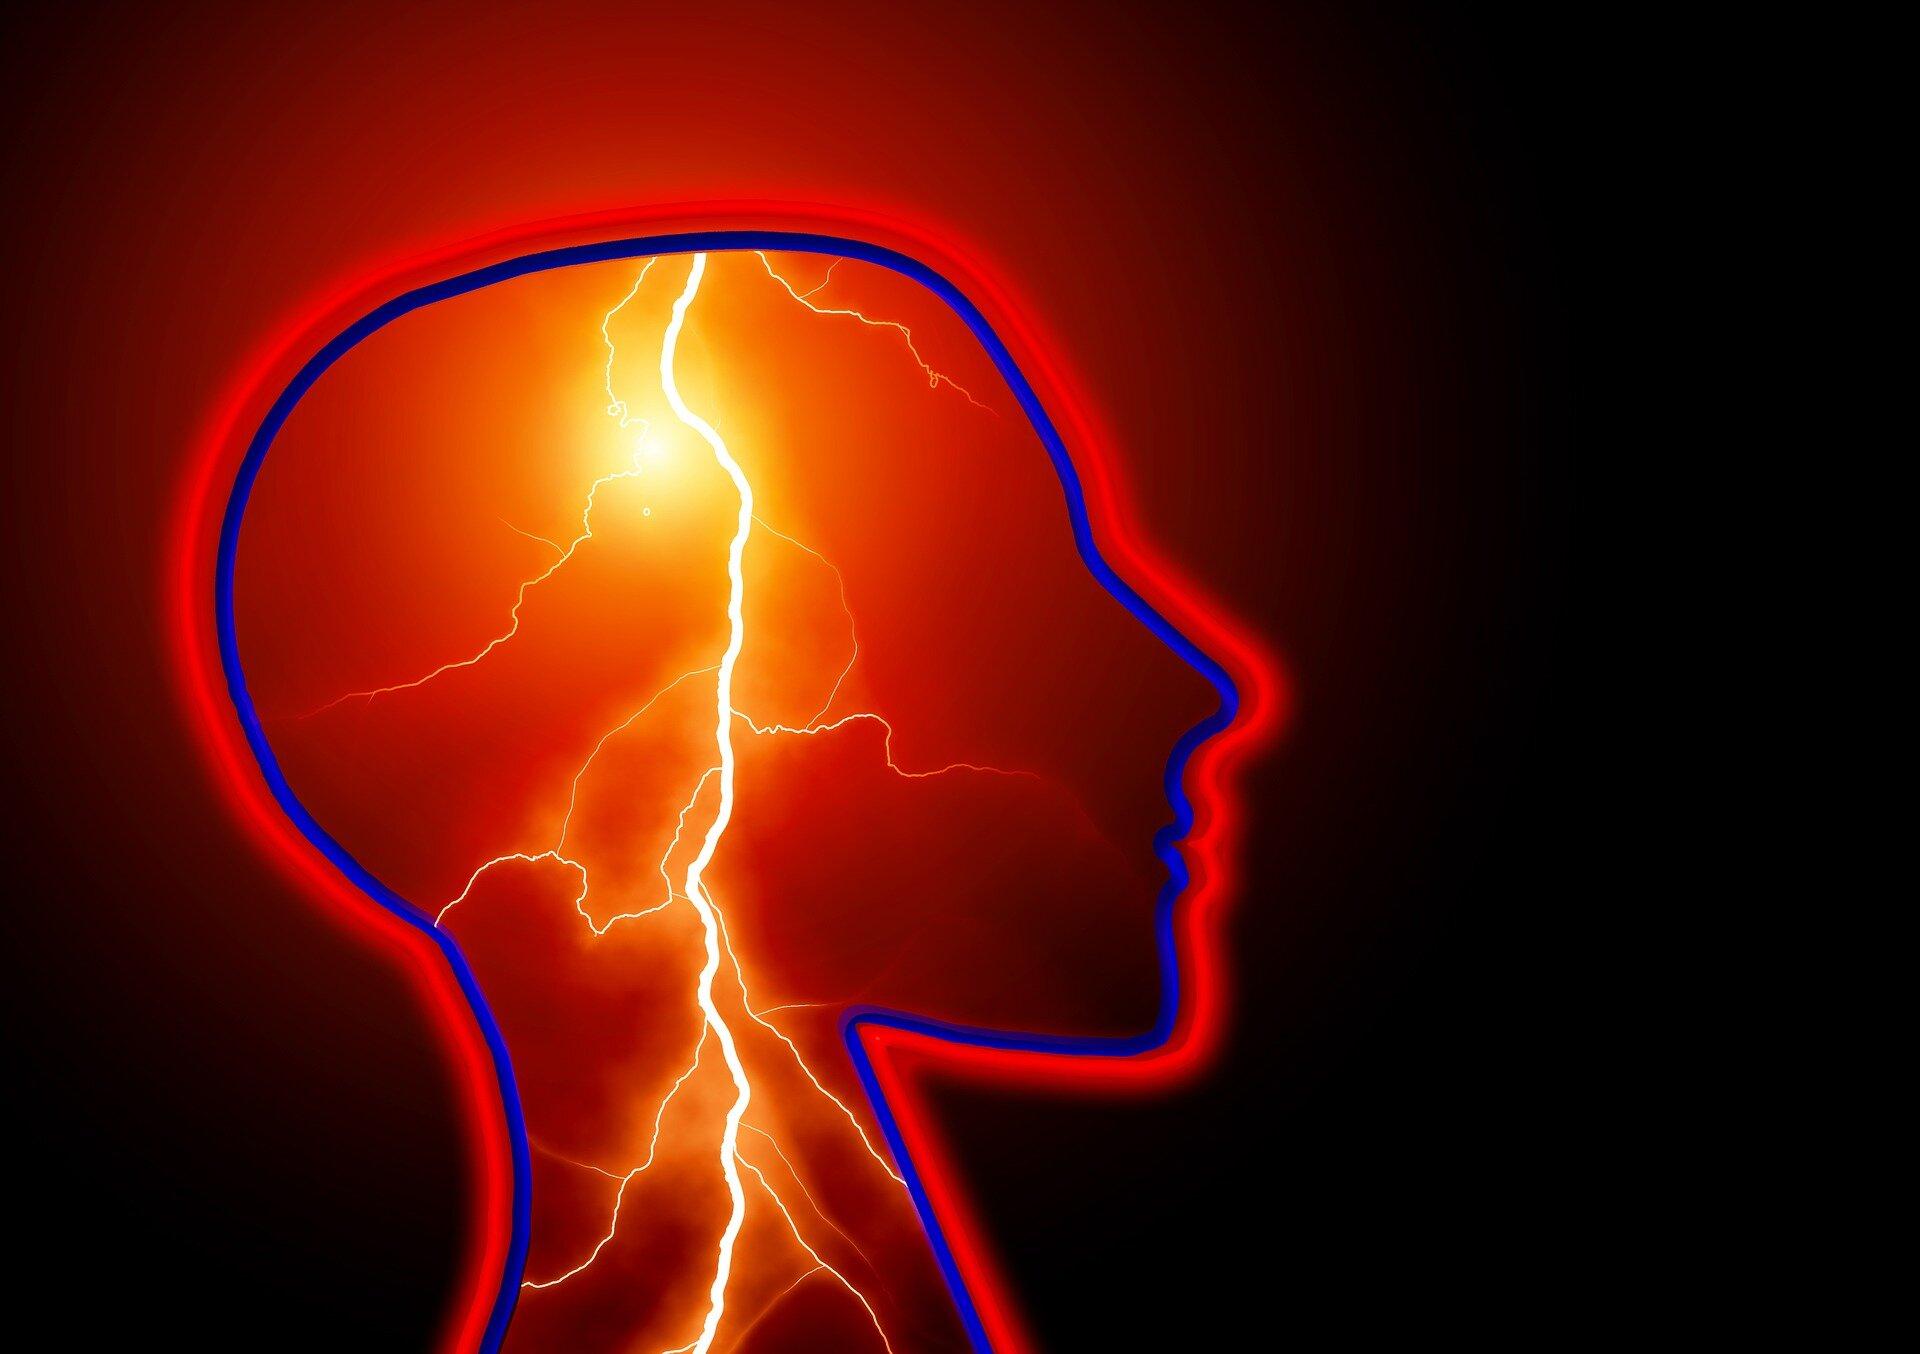 Ways to enhance neurolysin activity in the brain